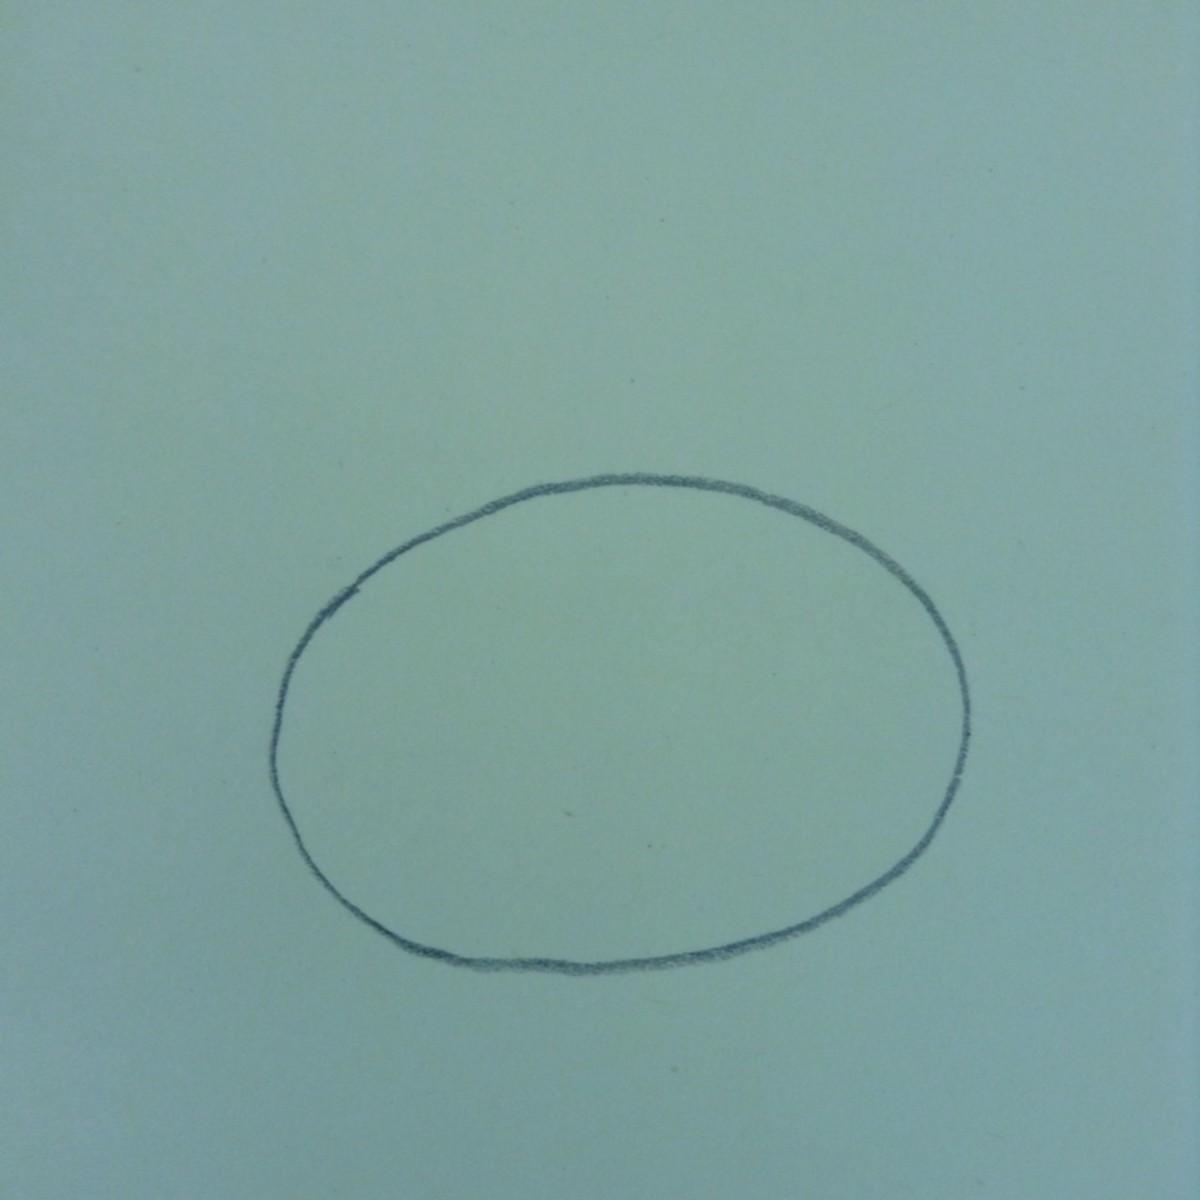 Step 1. Draw an oval.